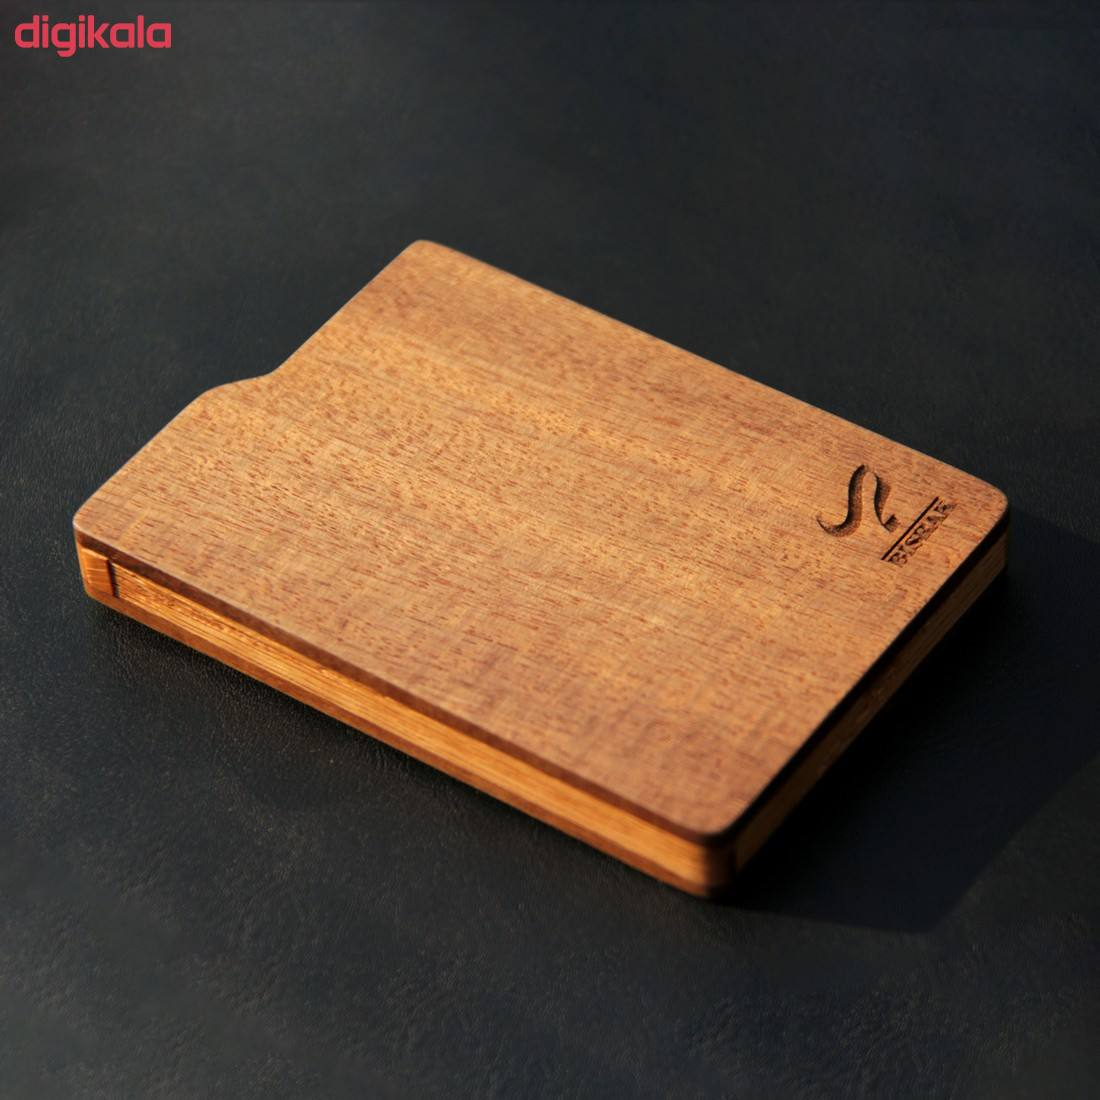 جاکارتی چرم بیسراک مدل J.Karti-903 main 1 3